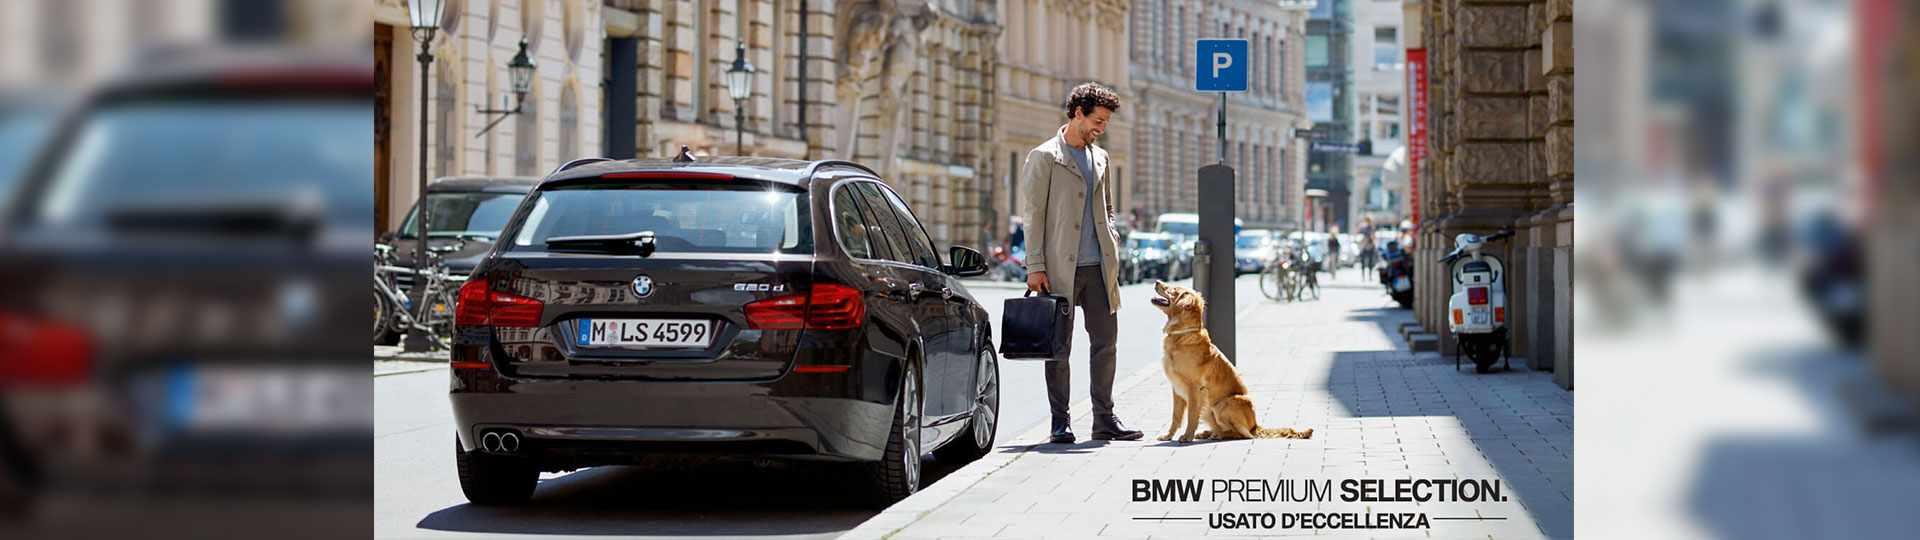 BMW-BPS.jpg